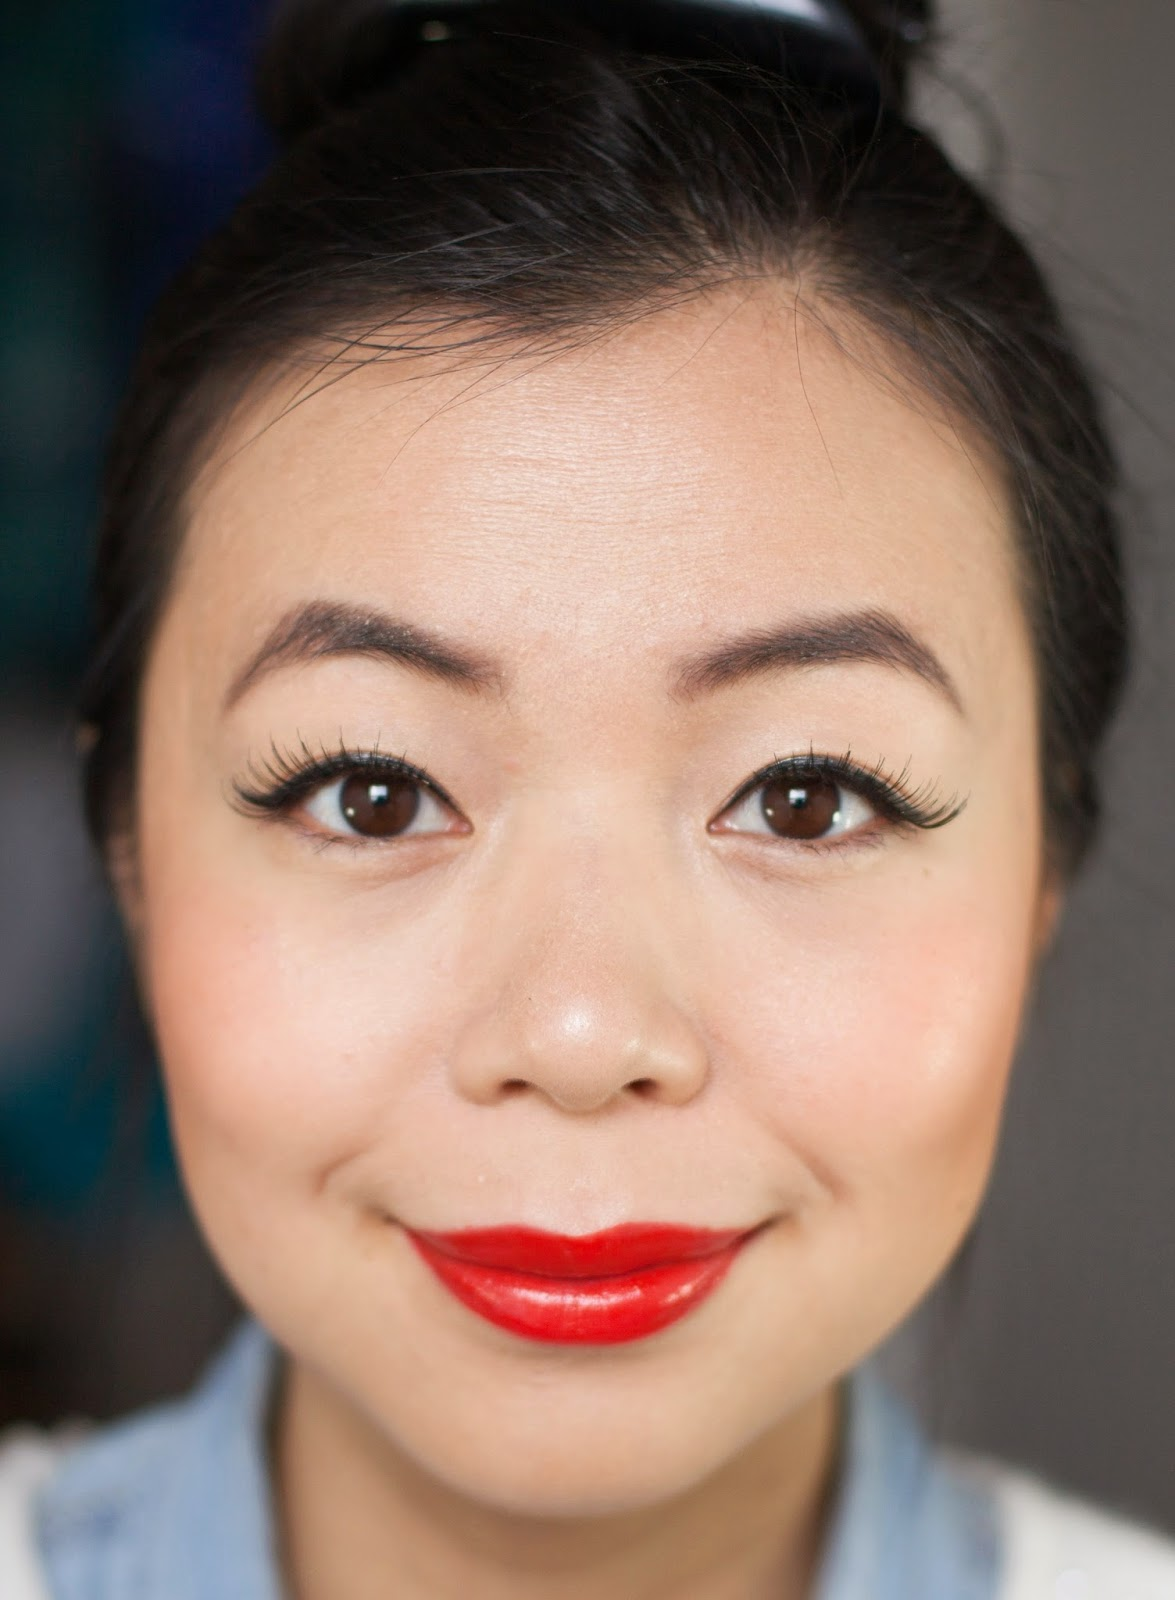 Wedding Makeup Liquid Eyeliner : Montreal Fashion Blog: Bouquet of Frocks: The Retro Bride